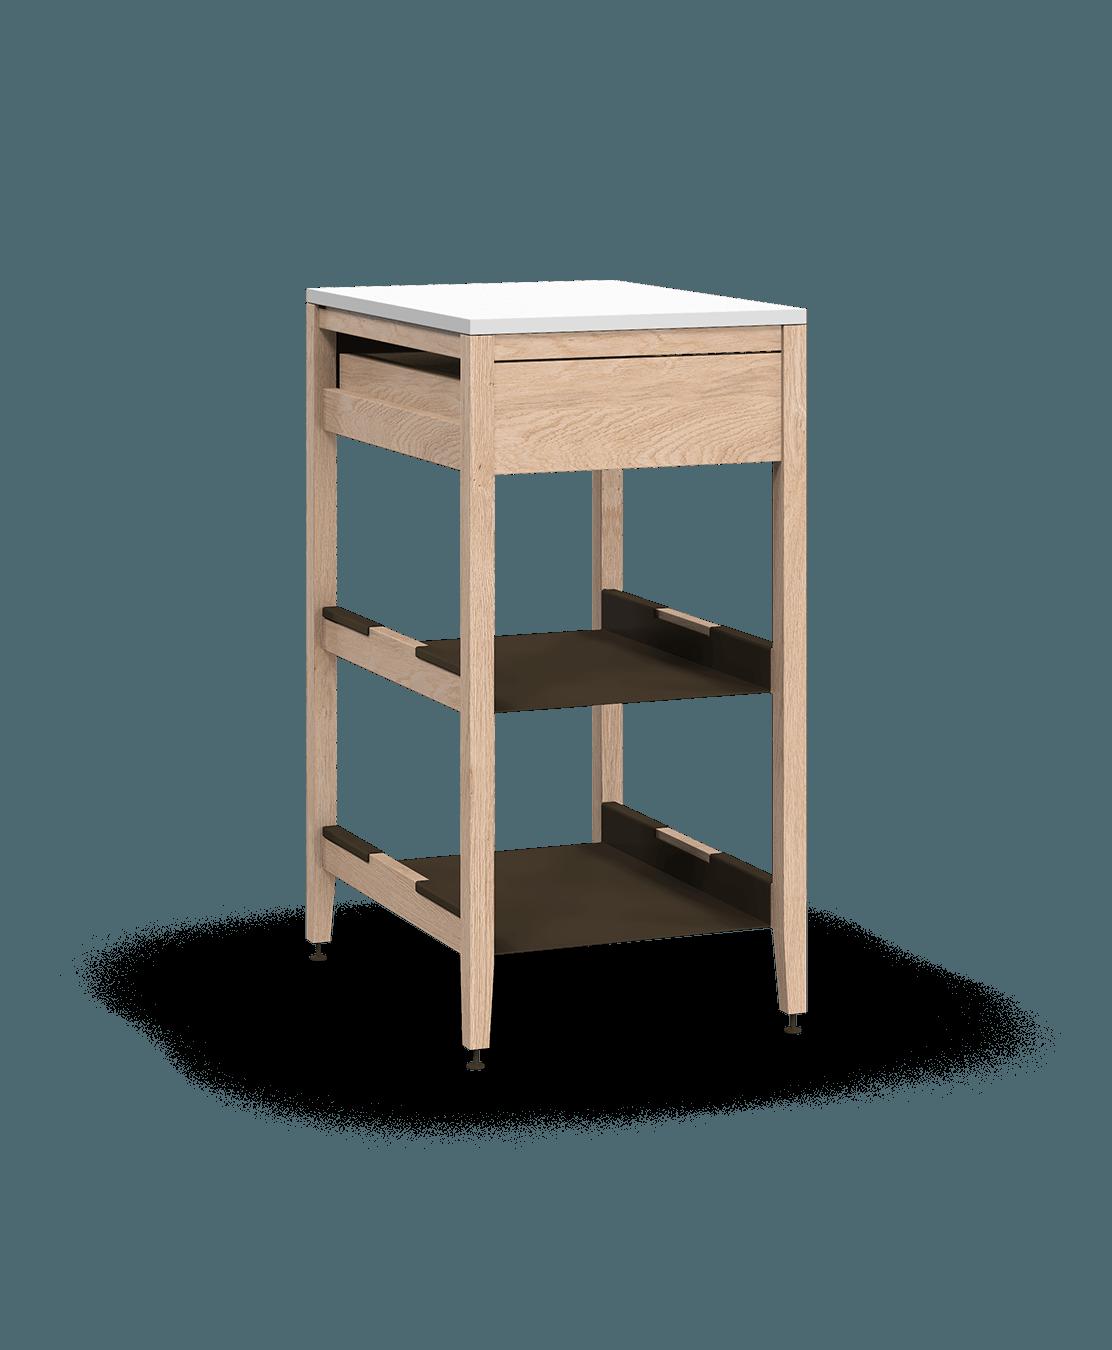 coquo radix white oak solid wood modular 2 shelves 1 drawer base kitchen cabinet 18 inch C1-C-18SB-1021-NA